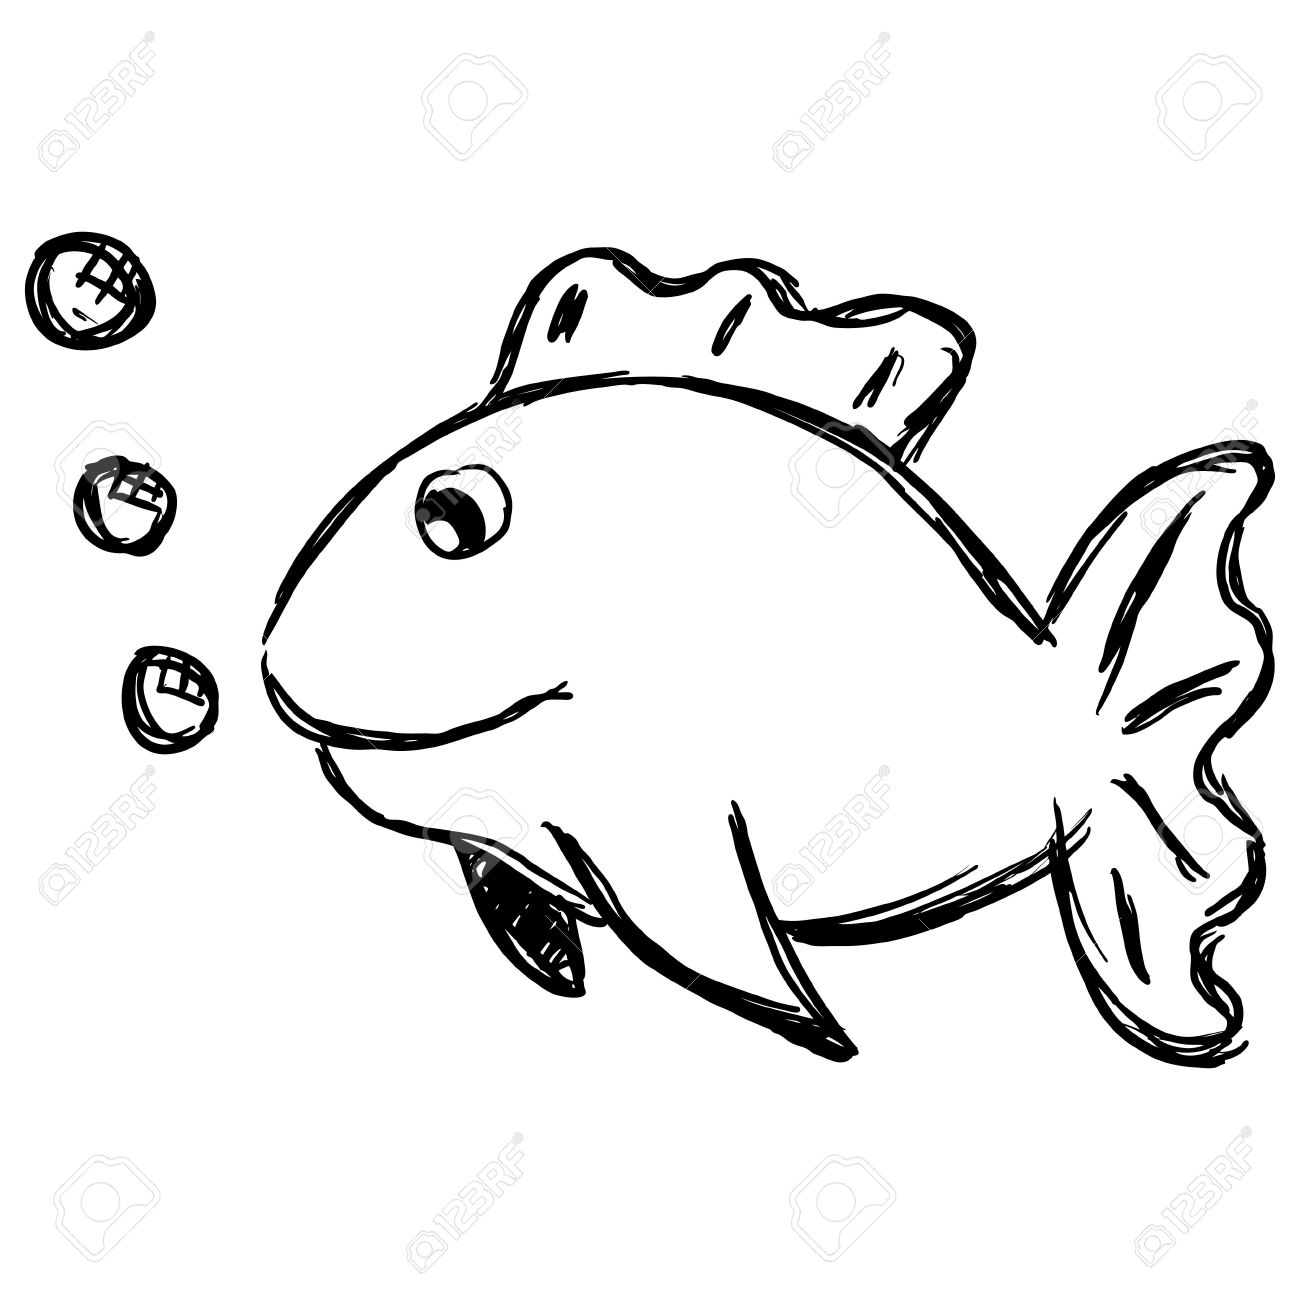 Sketch of a cartoon fish Stock Photo - 2734482